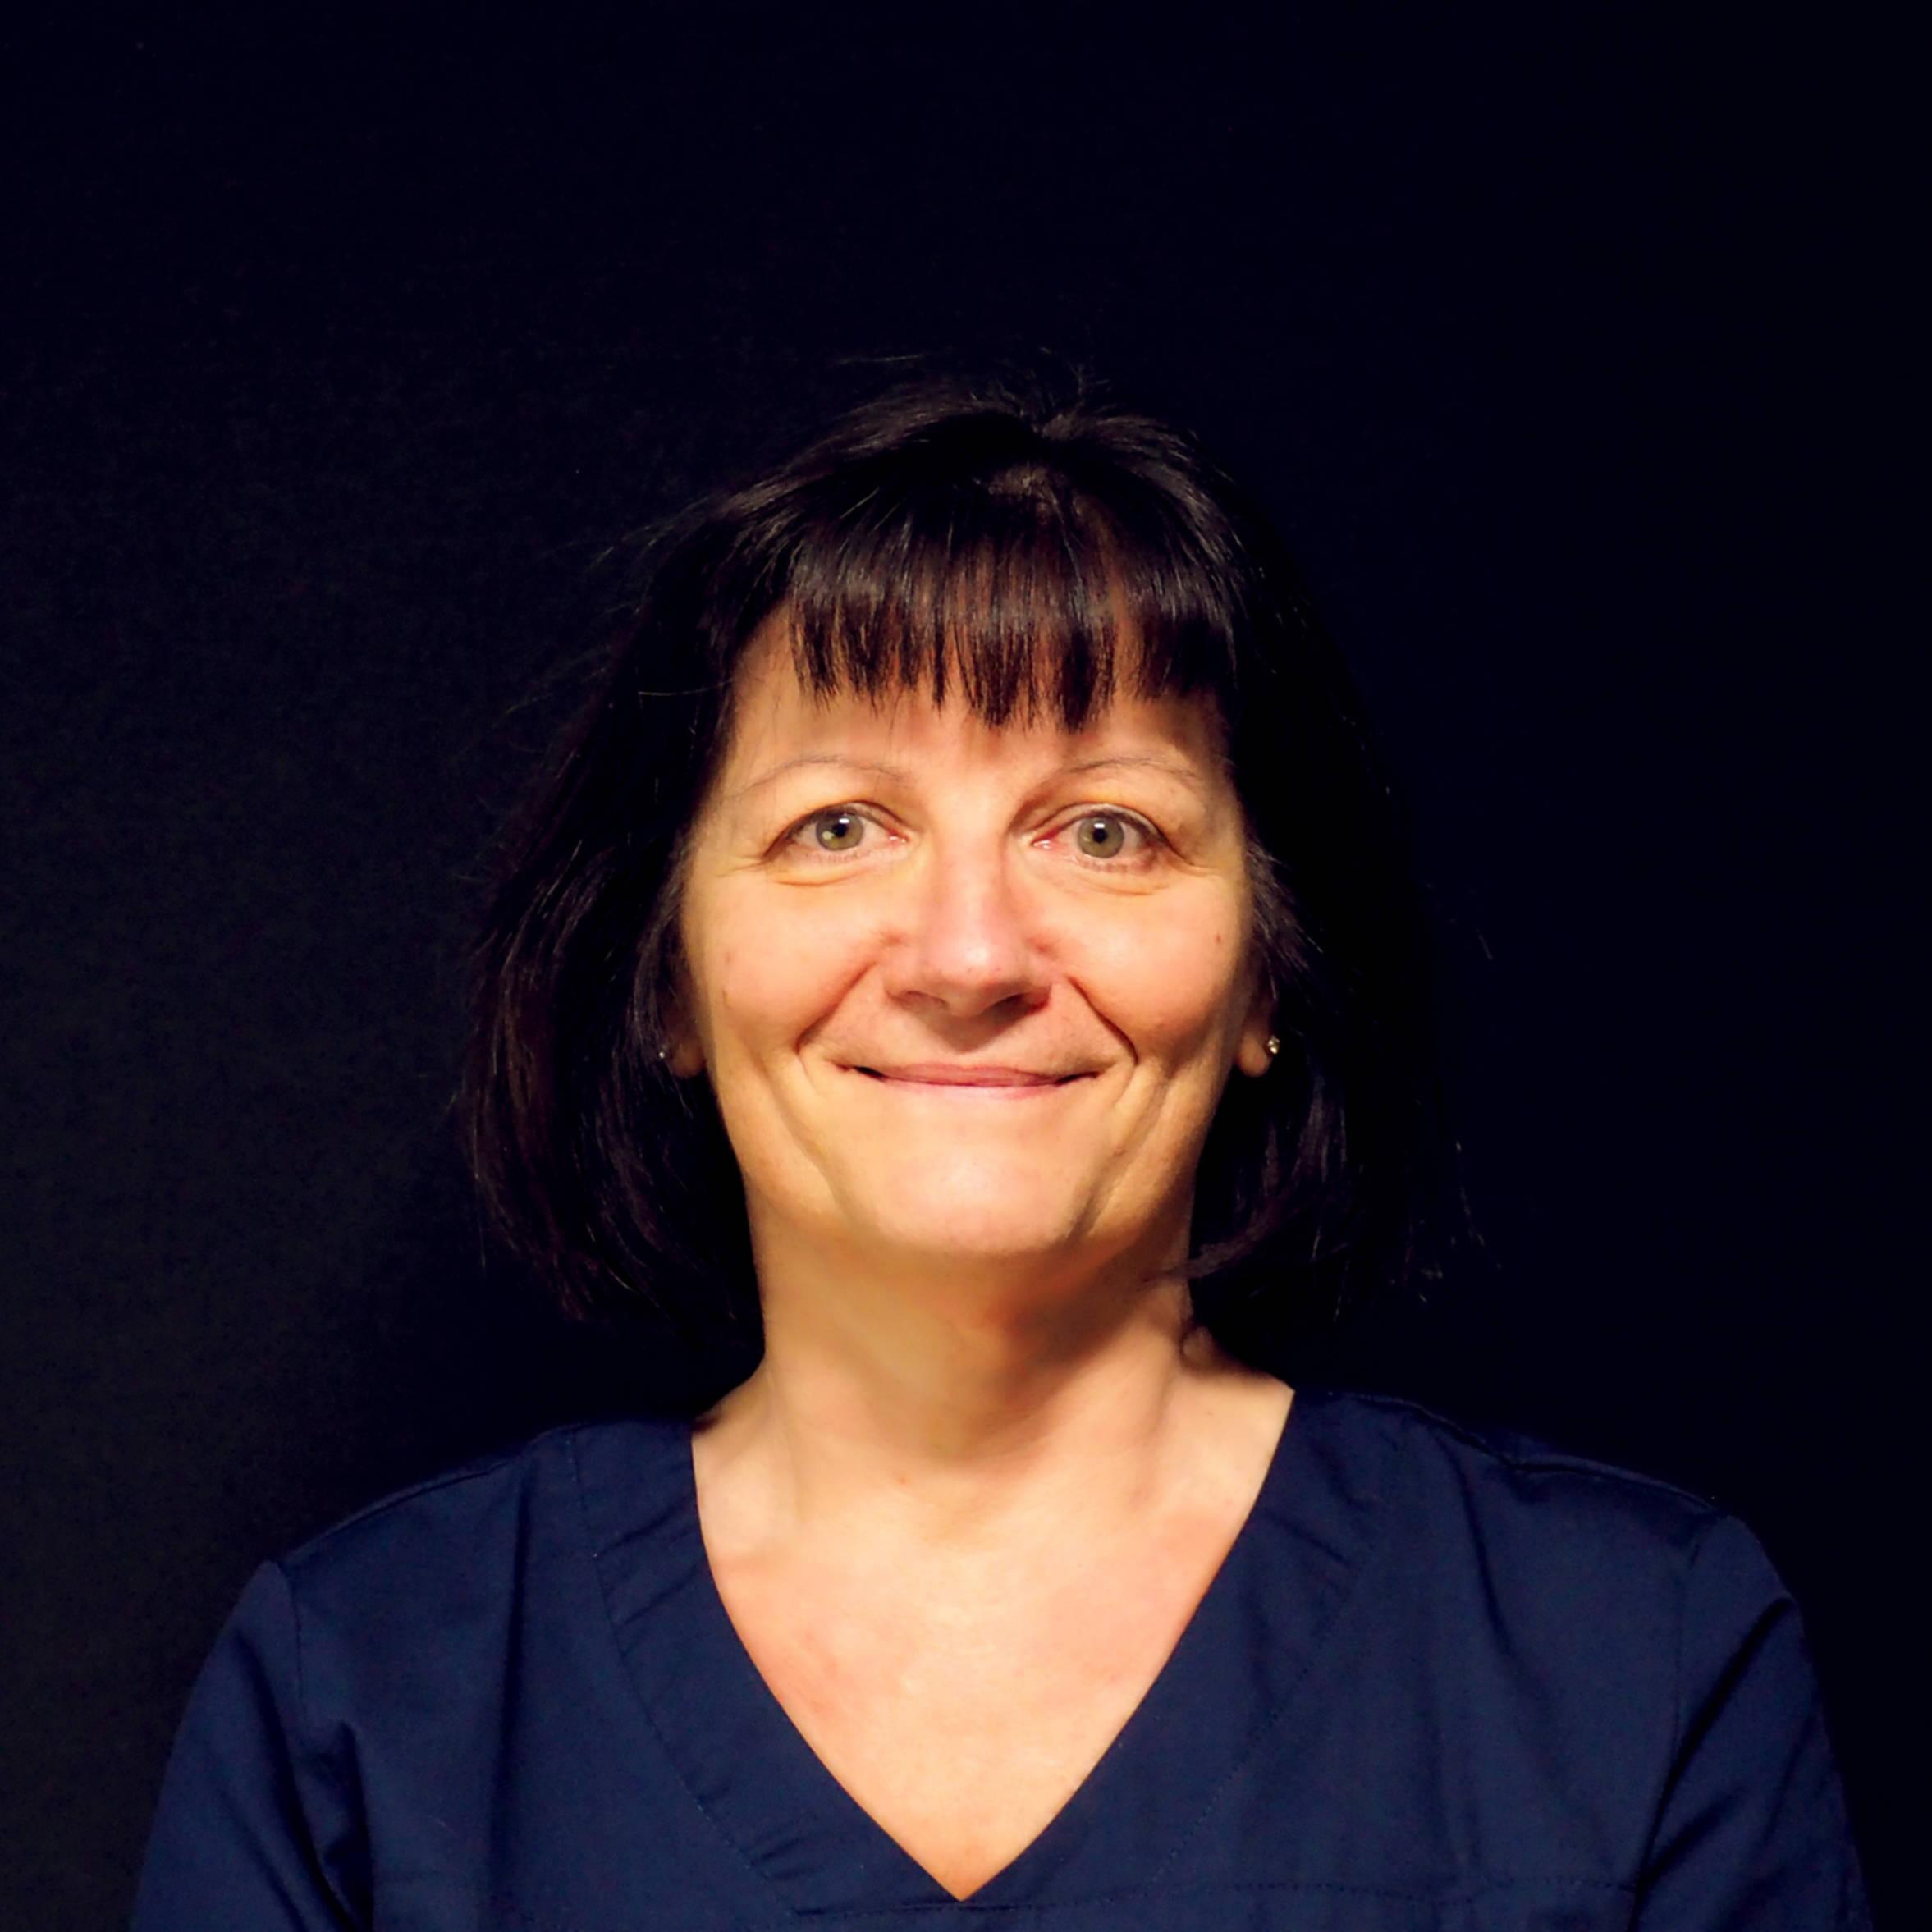 Hélène DELMAS